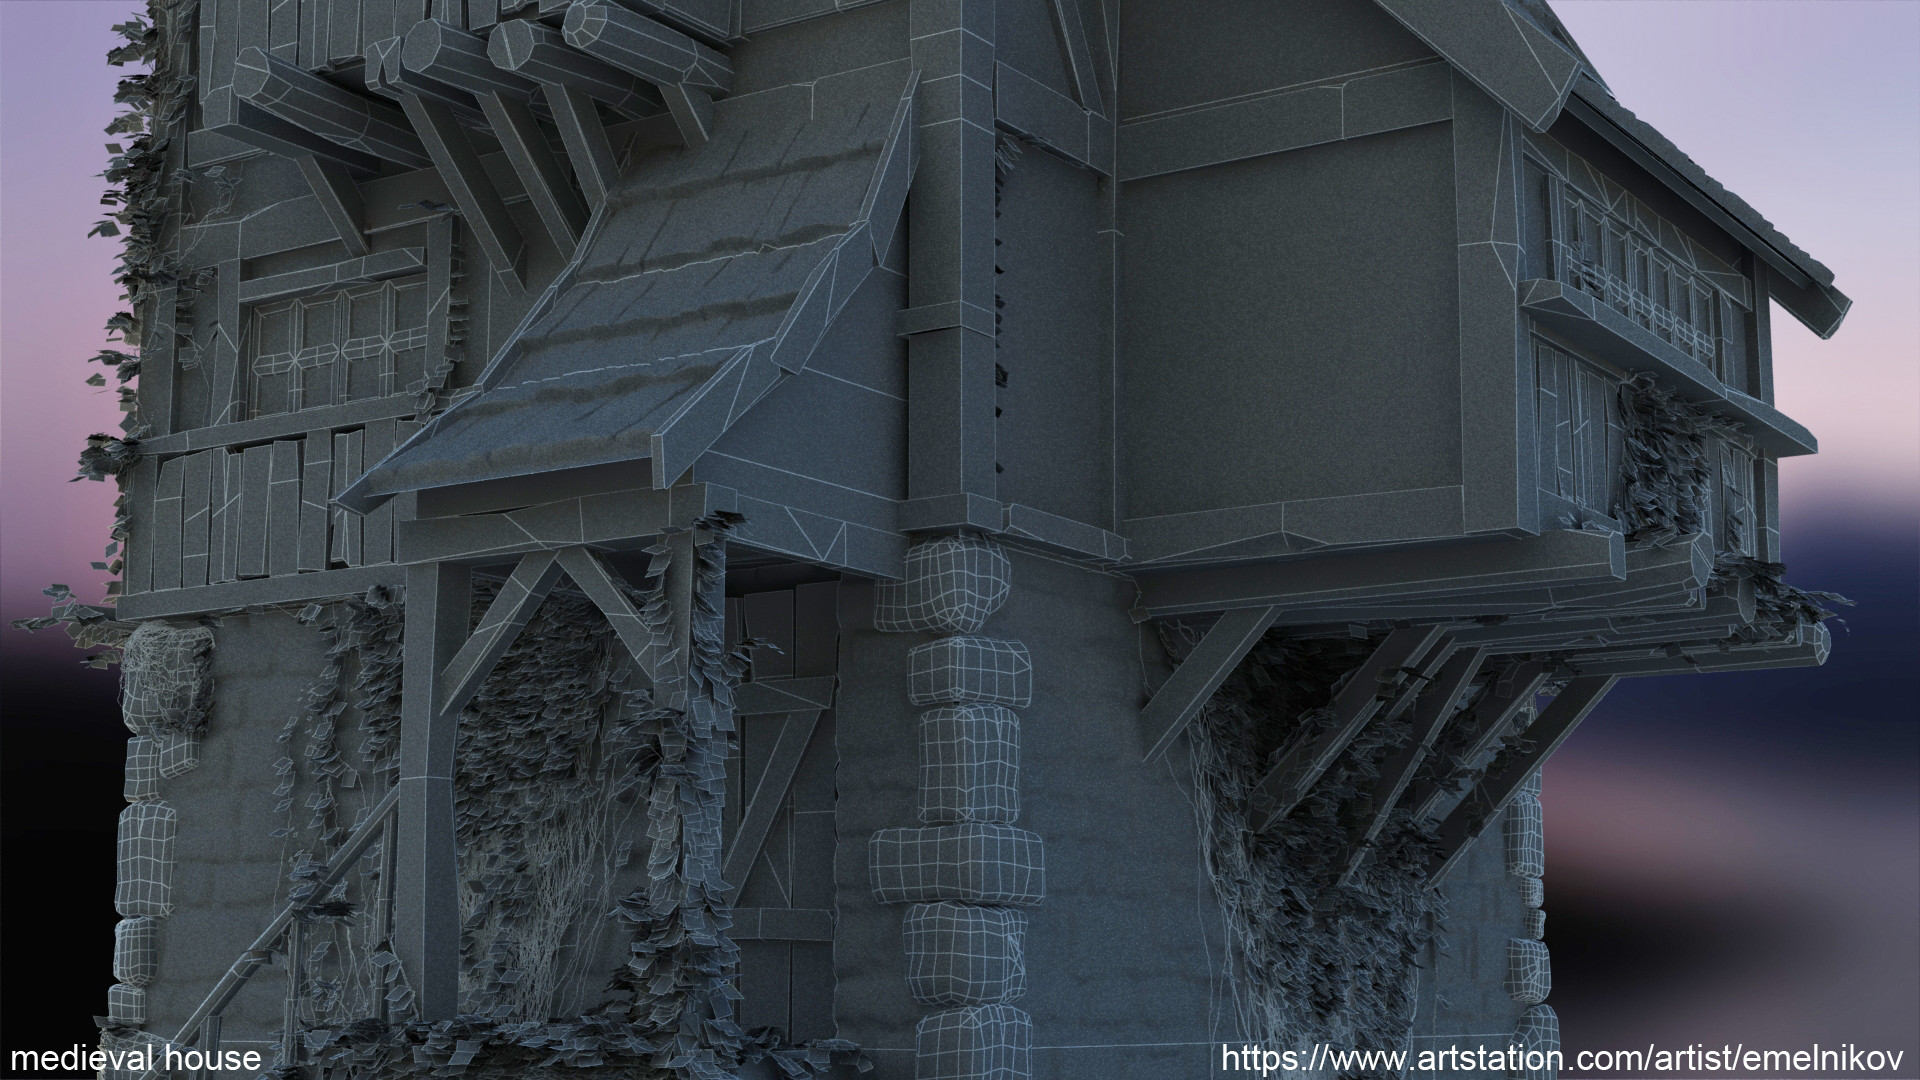 Eugene melnikov medieval house1 render frm13 wire